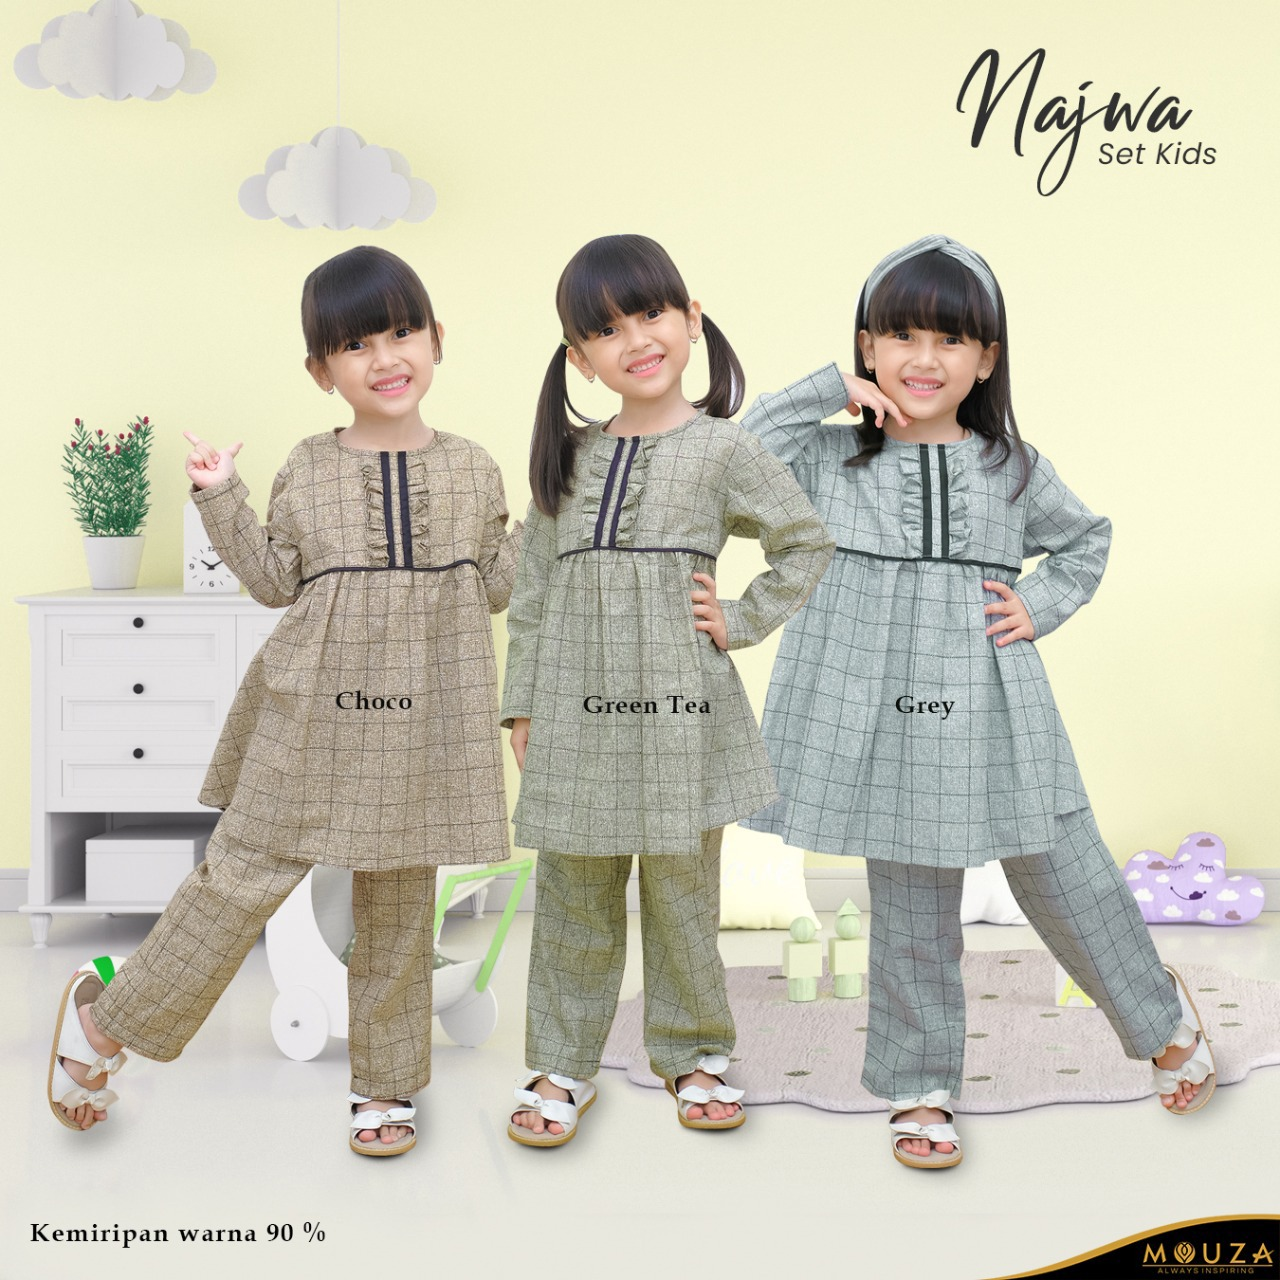 Najwa Set Kids